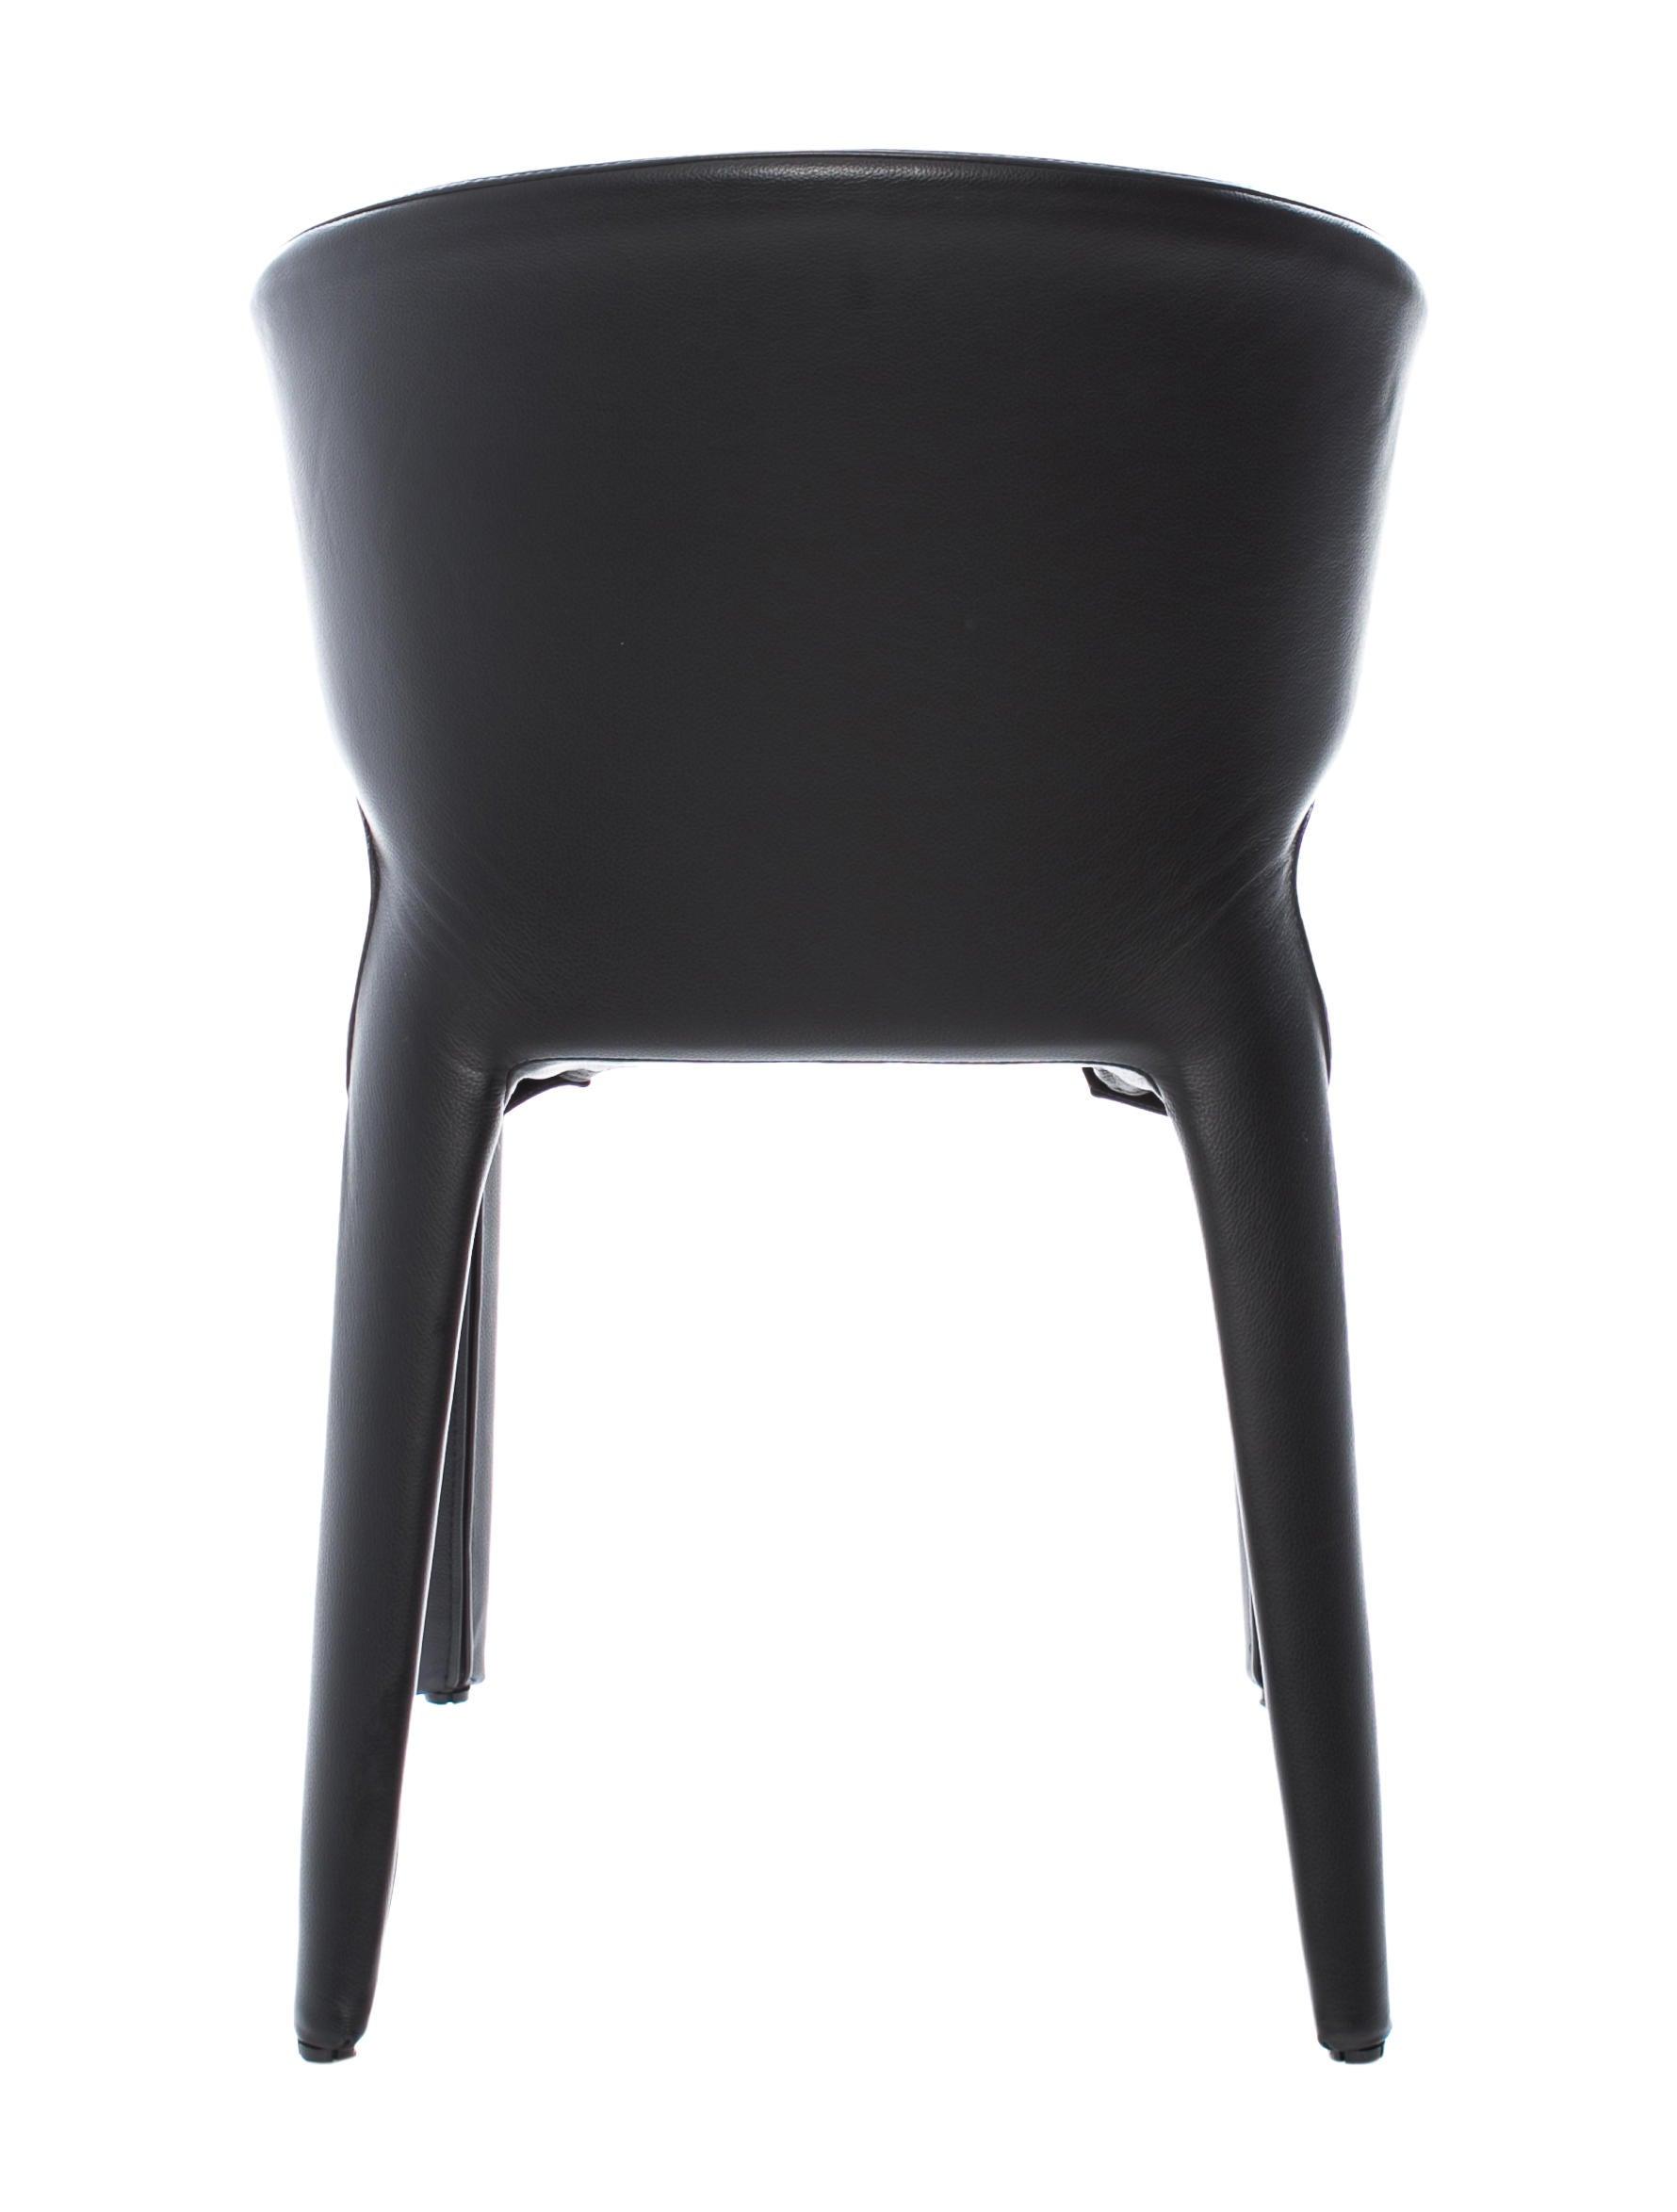 "Cassina ""Hola 367"" Chair - Furniture - CSI20007"